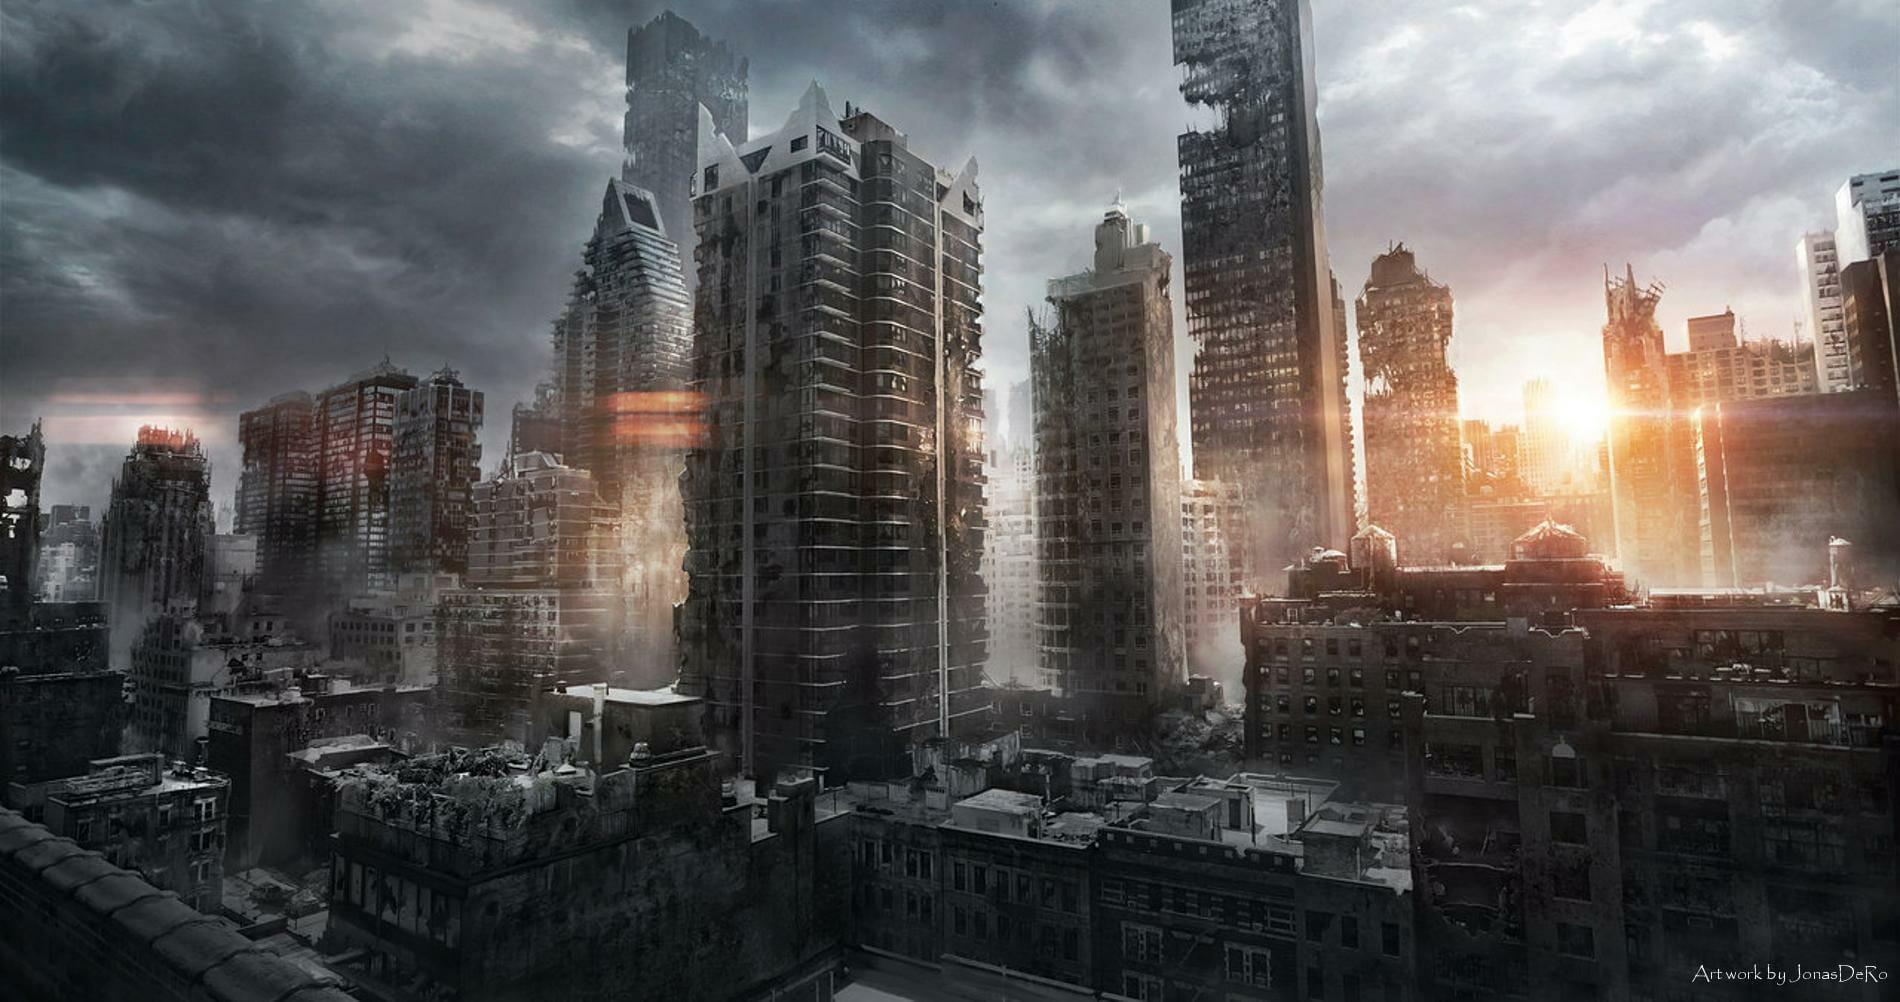 Robert Kiyosaki: Last Call for Reality – Dreamers Will Not Do Well